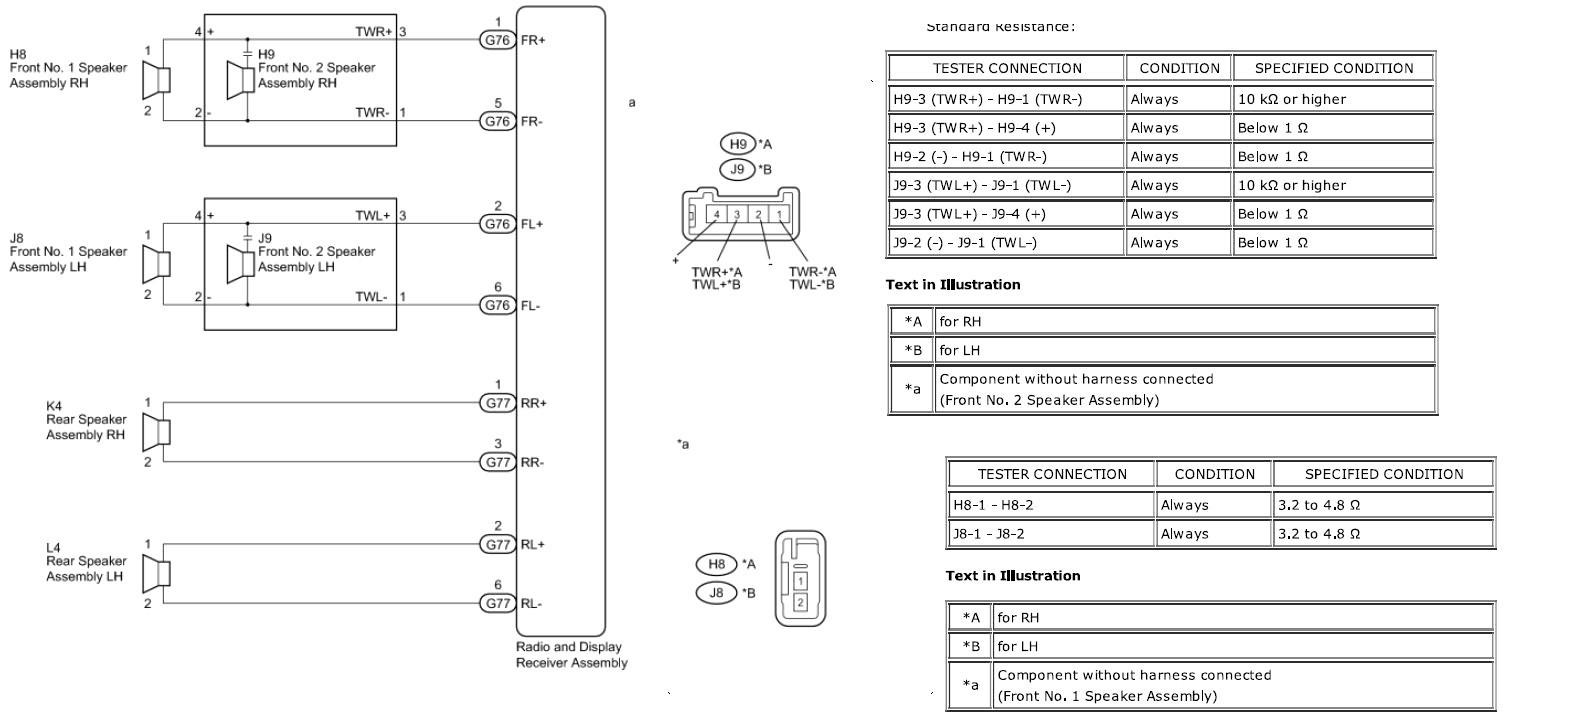 Alpine Power Pack Wiring Diagram Ktp 445U | Wiring Library - Alpine Ktp 445 Wiring Diagram